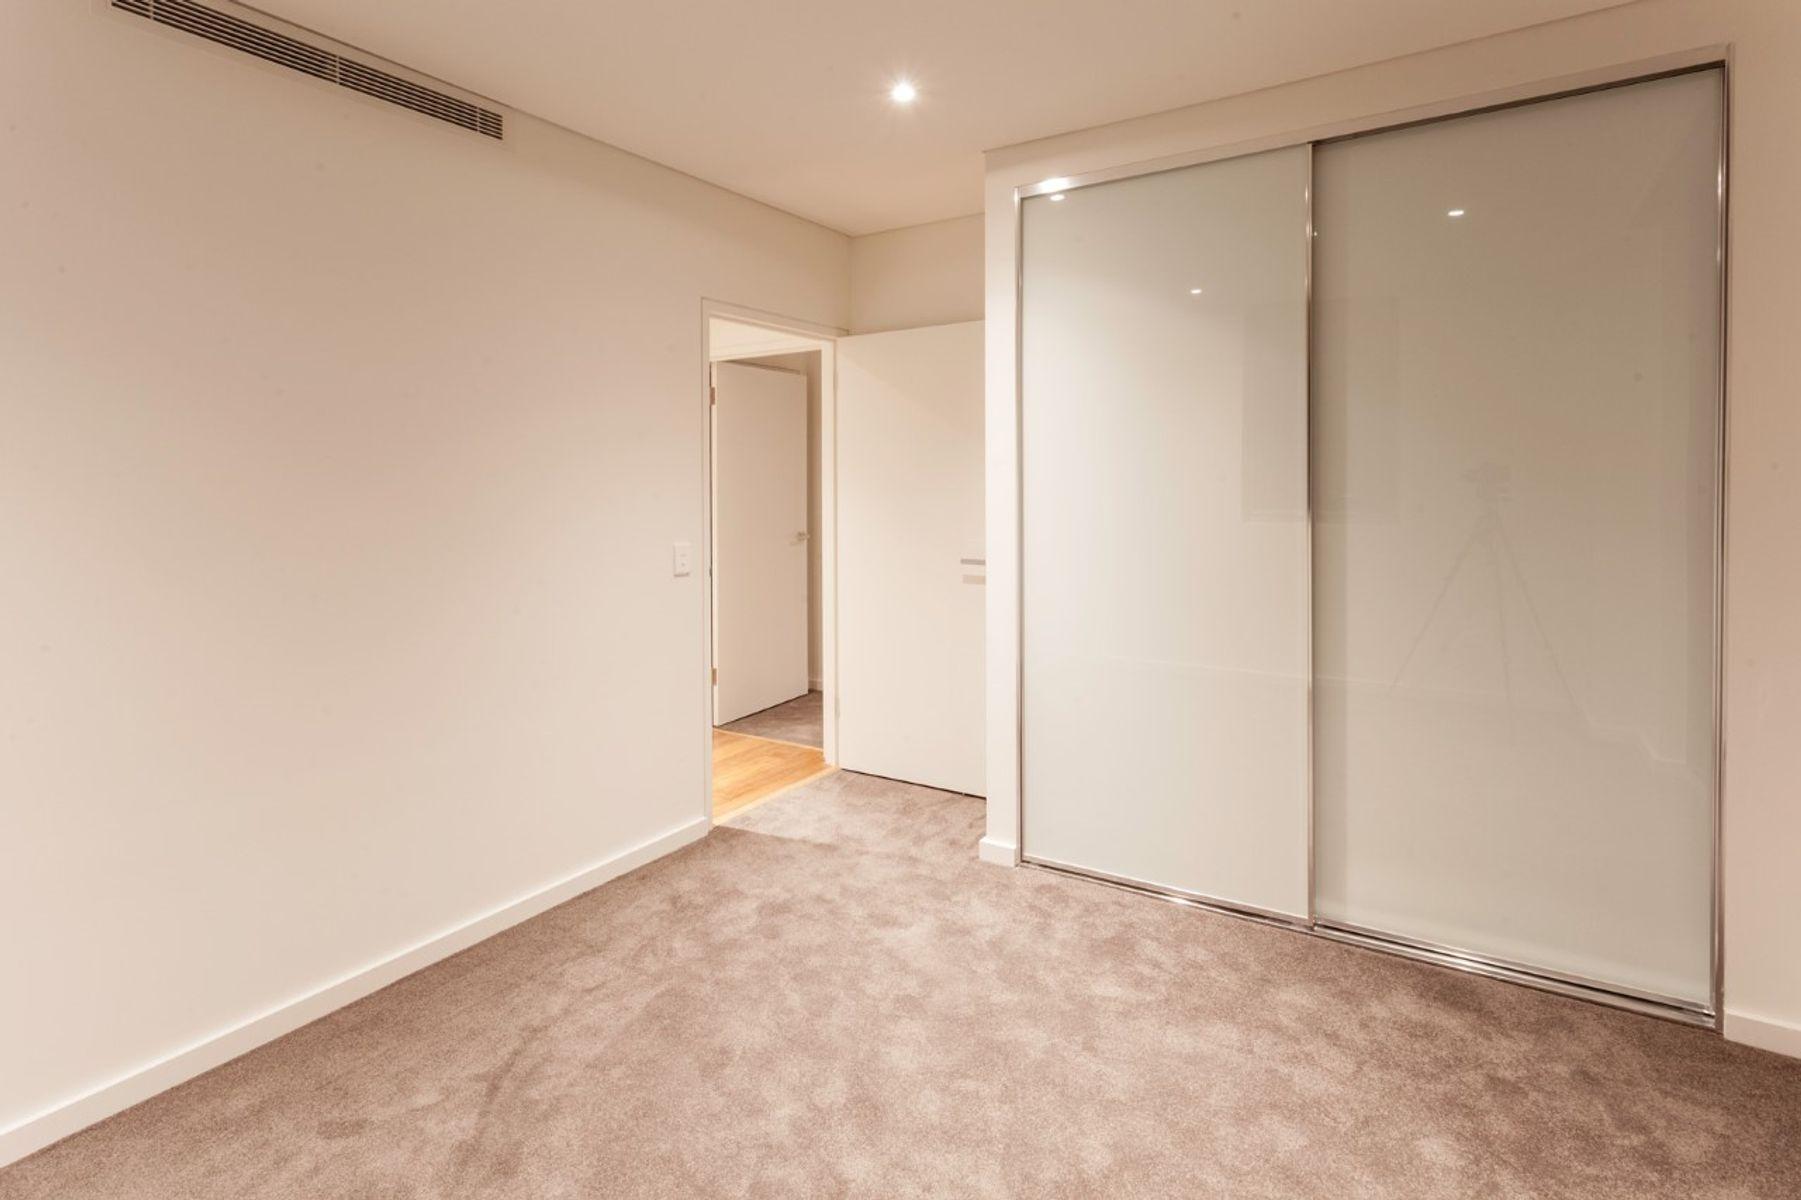 C601/7-13 Centennial Avenue, Lane Cove North, NSW 2066